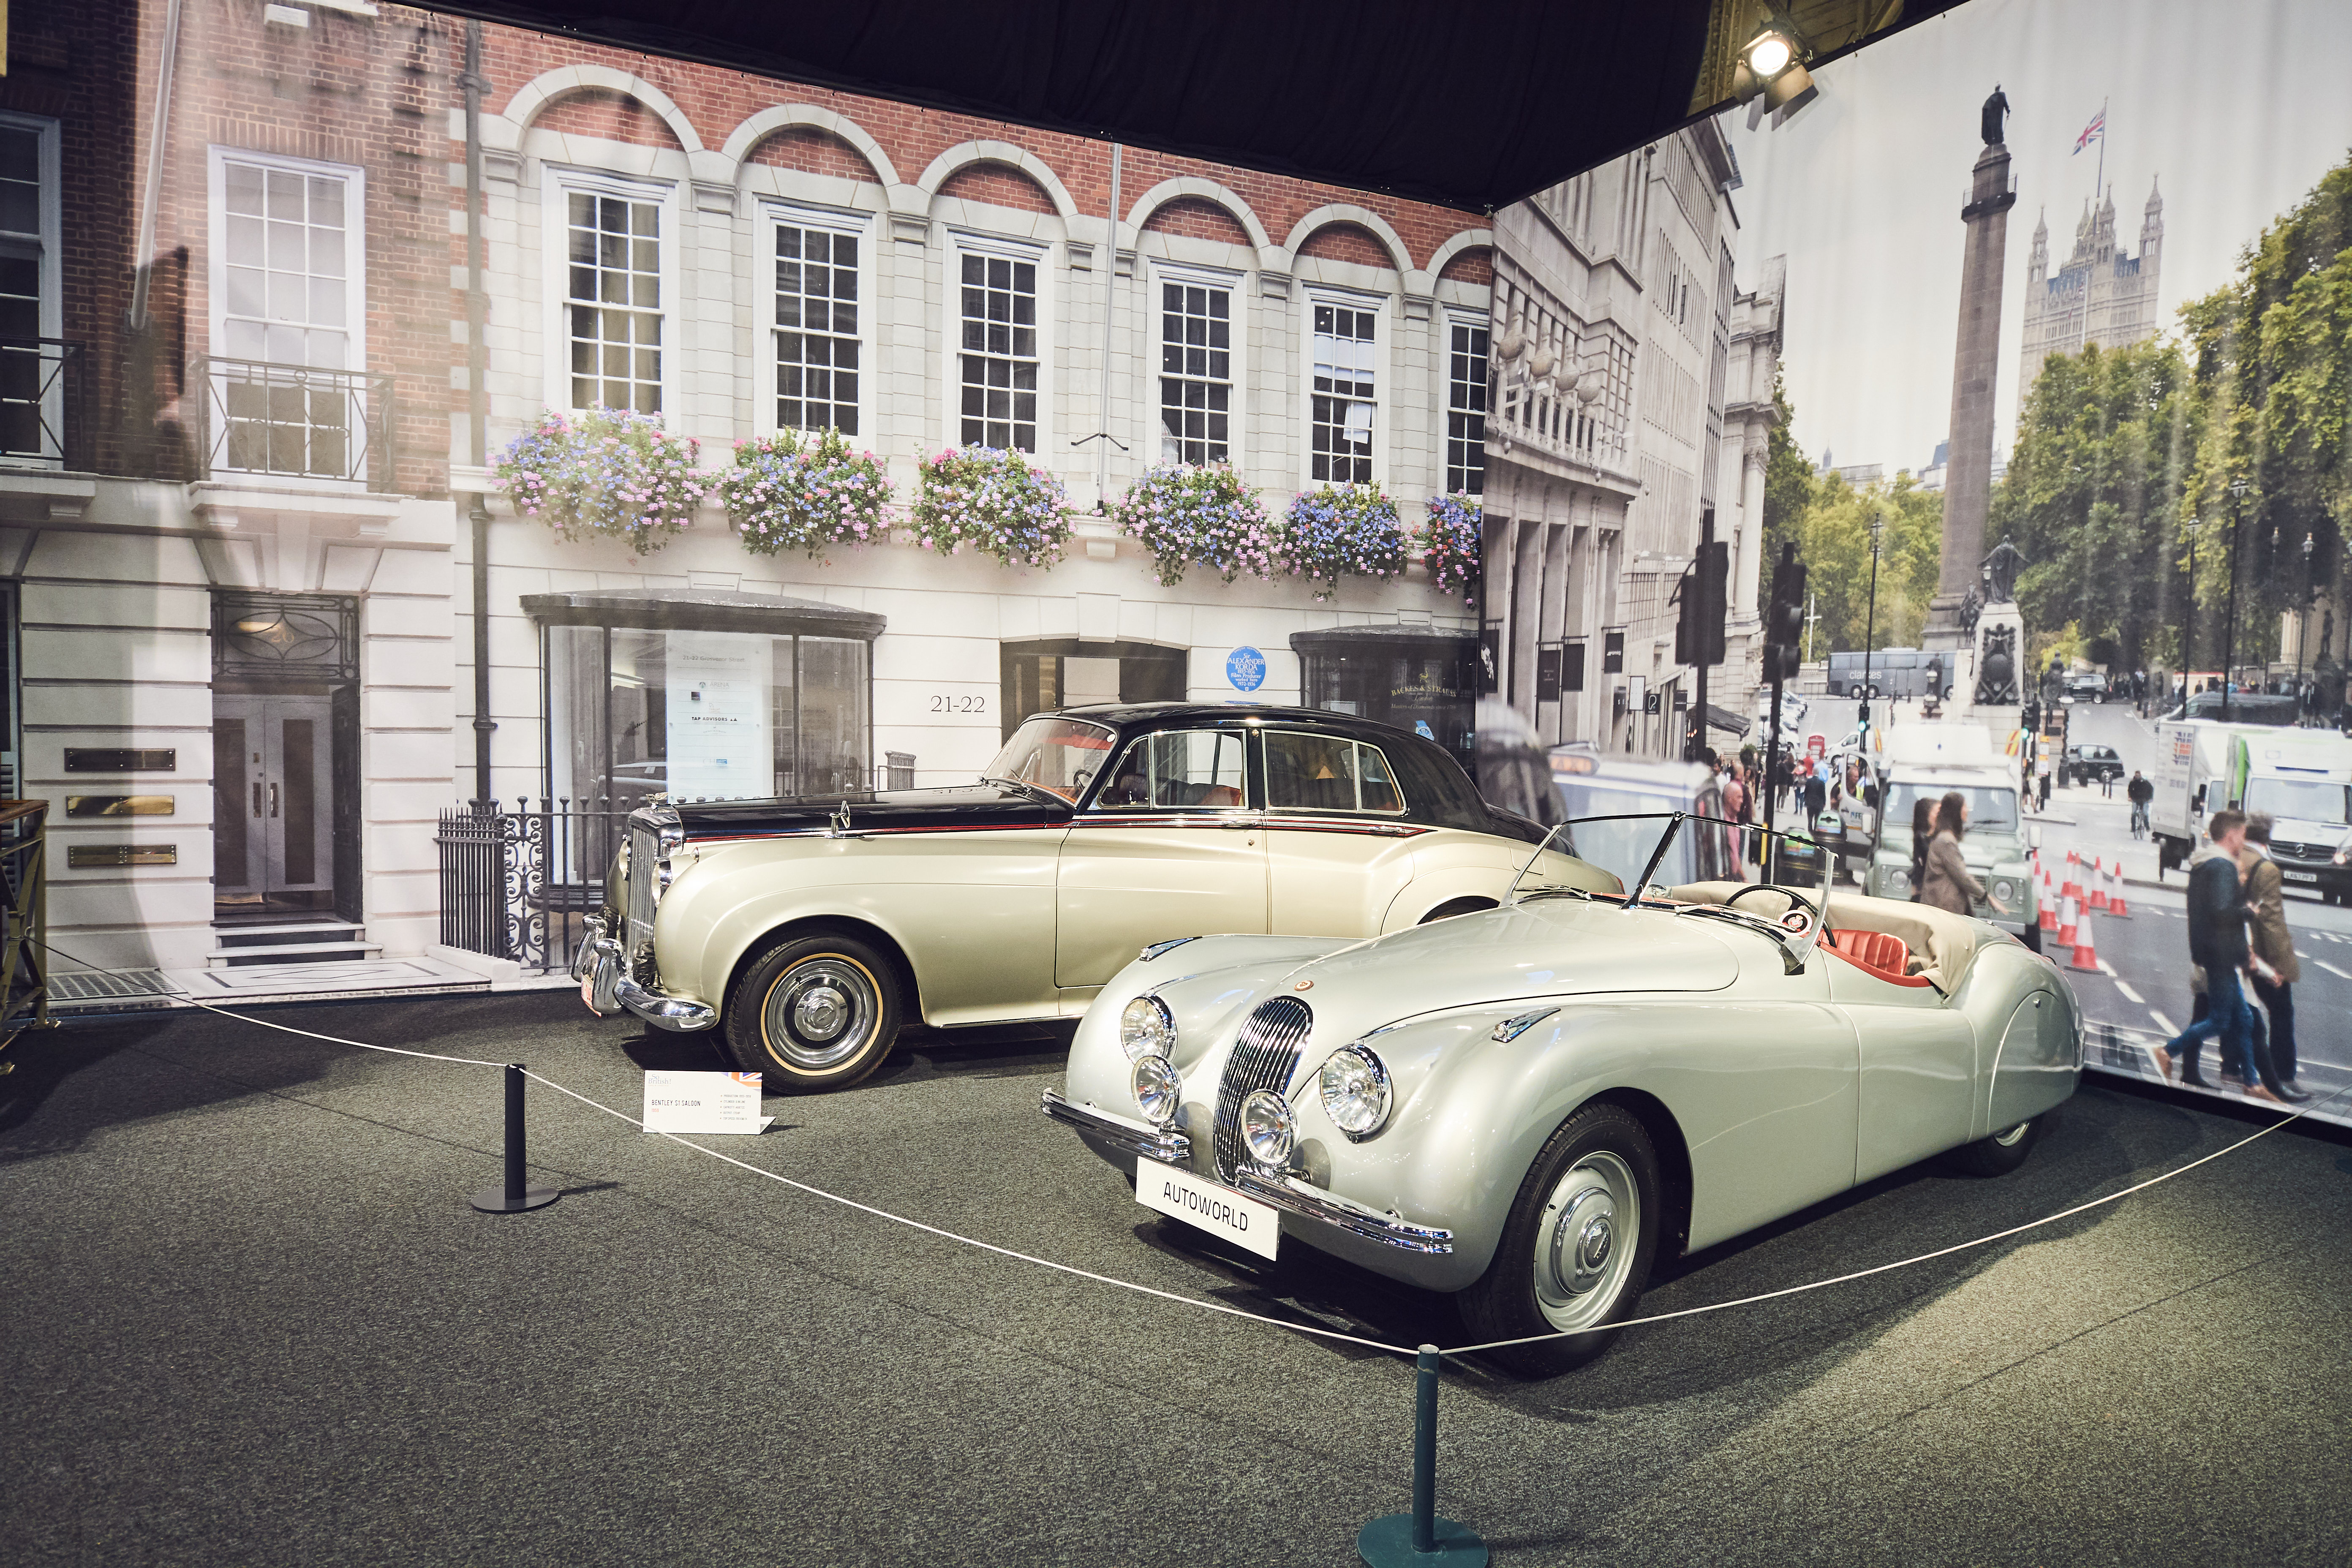 191212-Autoworld-So-British! exposition 07